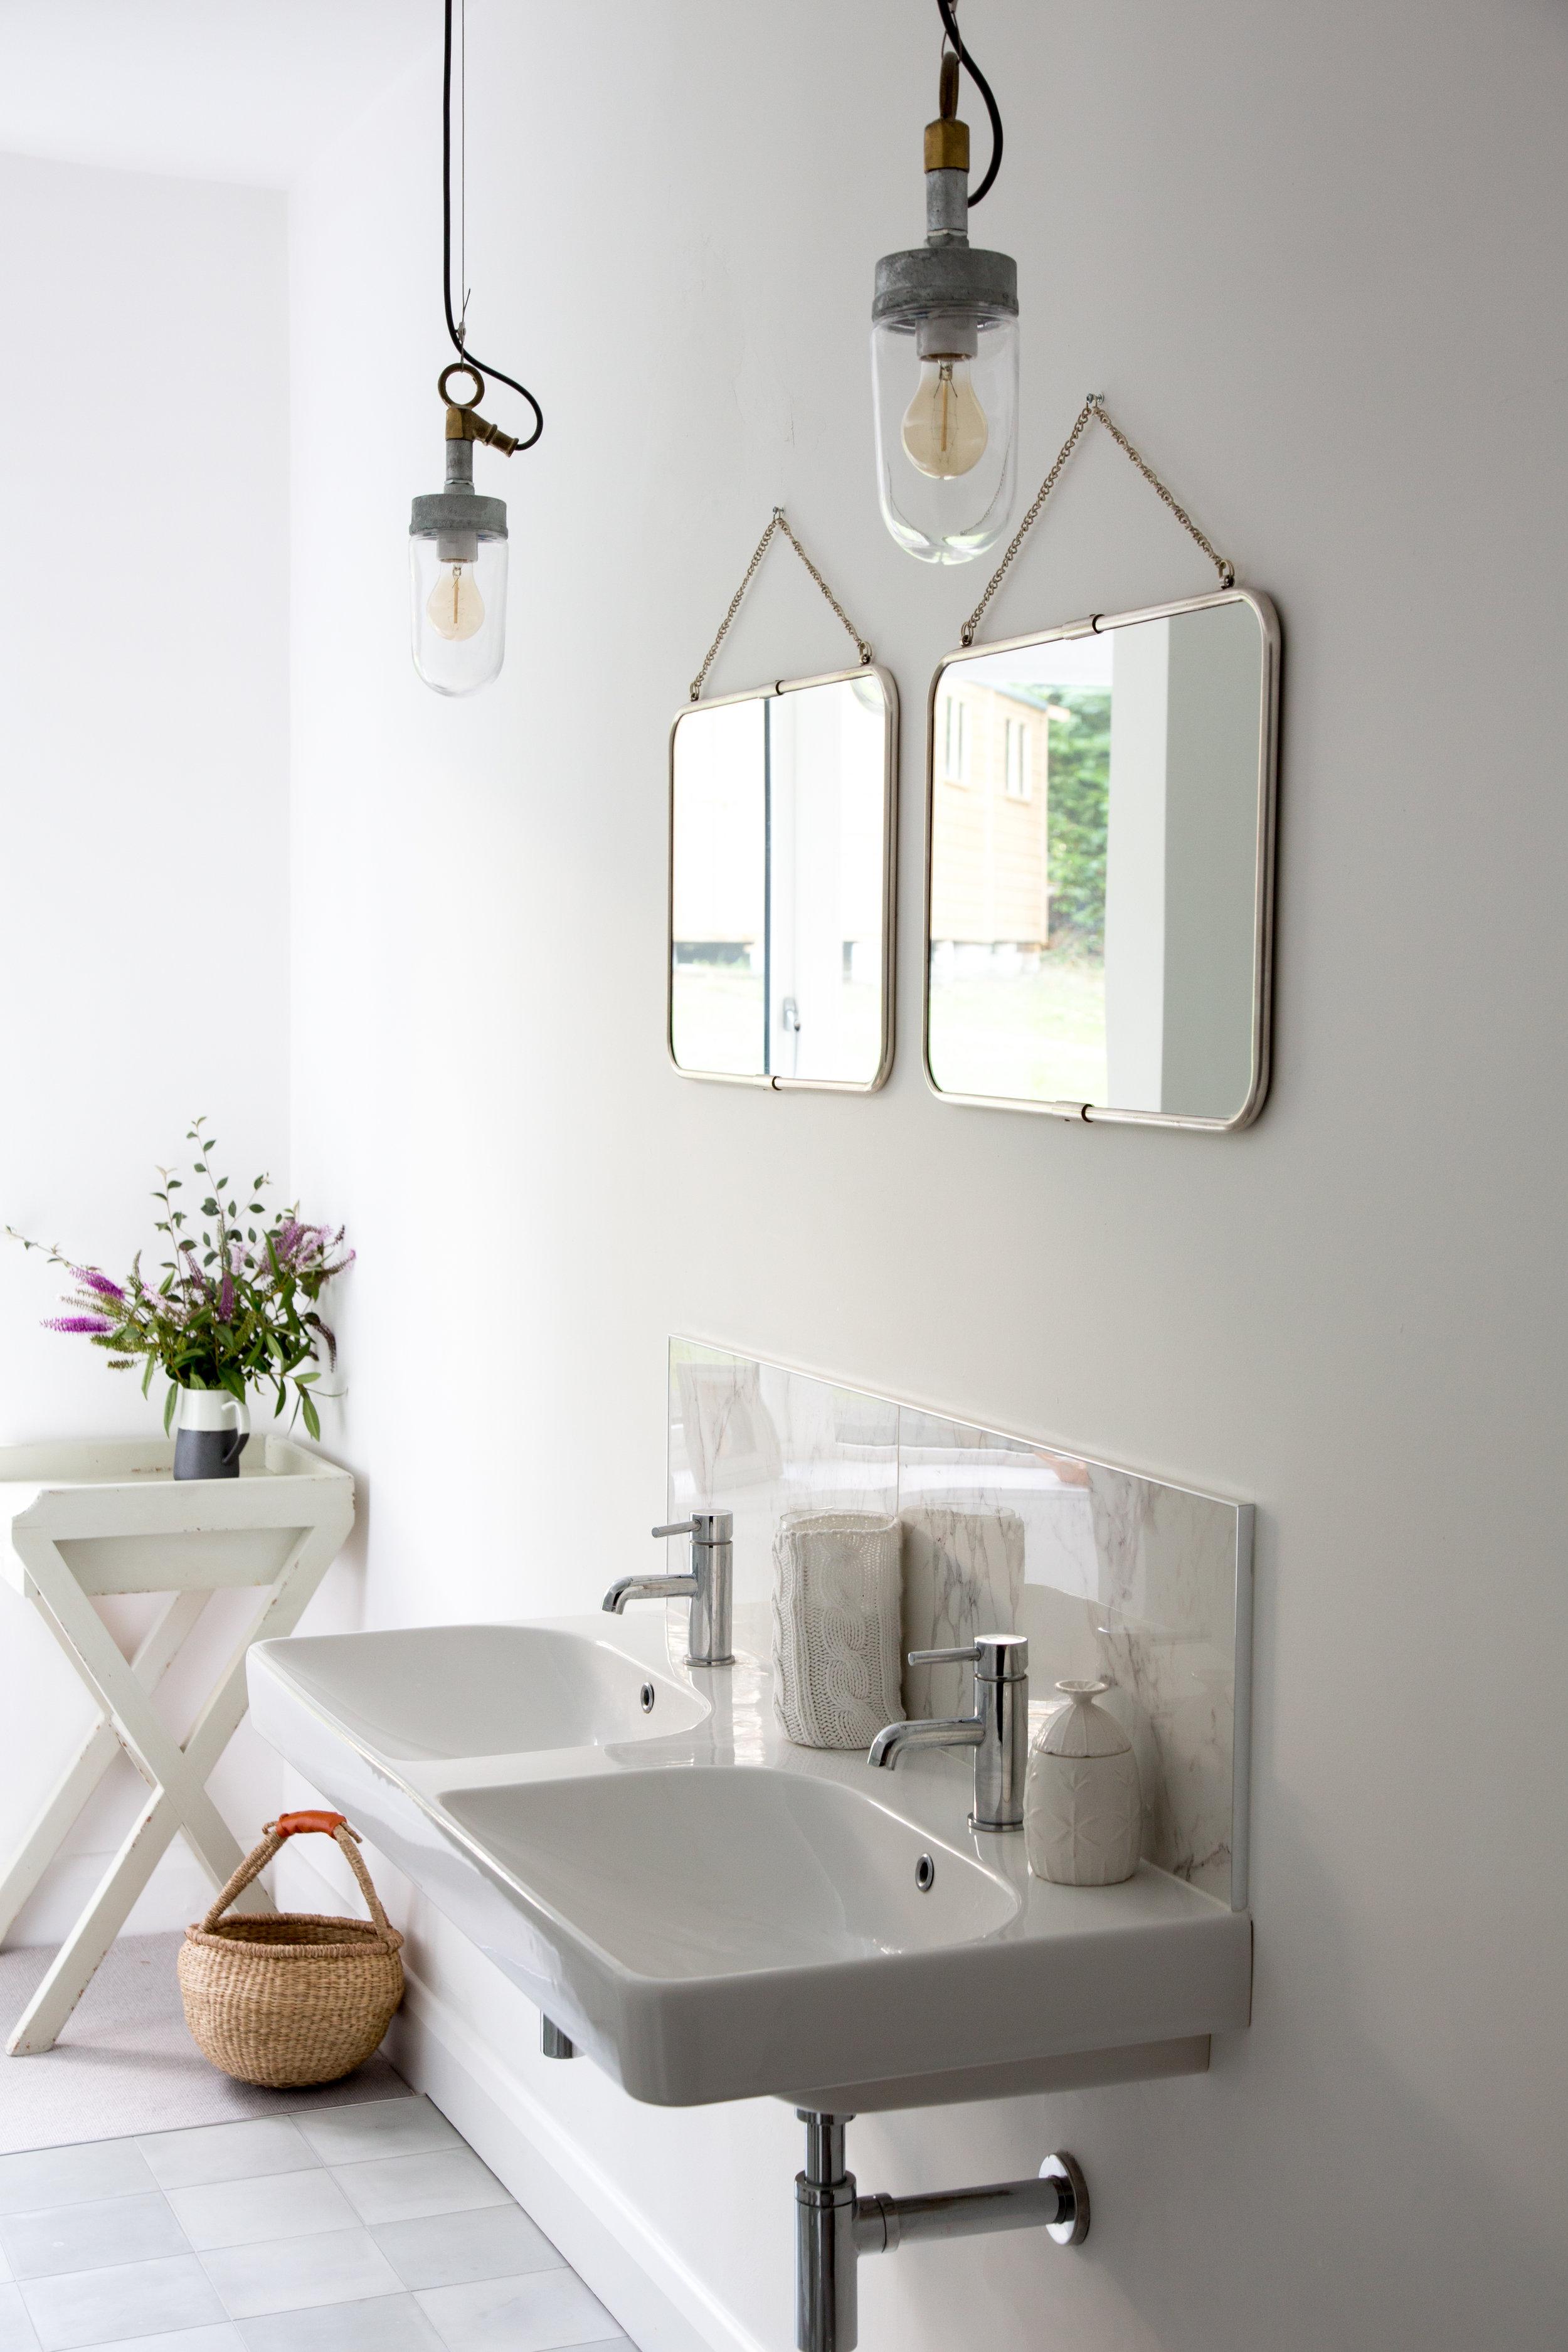 Lamb_Design_Paper_and_Moon_Emma_Lynch_Louise_Dockery_Scandi_French_Danish_homeware_Irish_business_interior_designer_vintage_mirror_bathroom.jpg